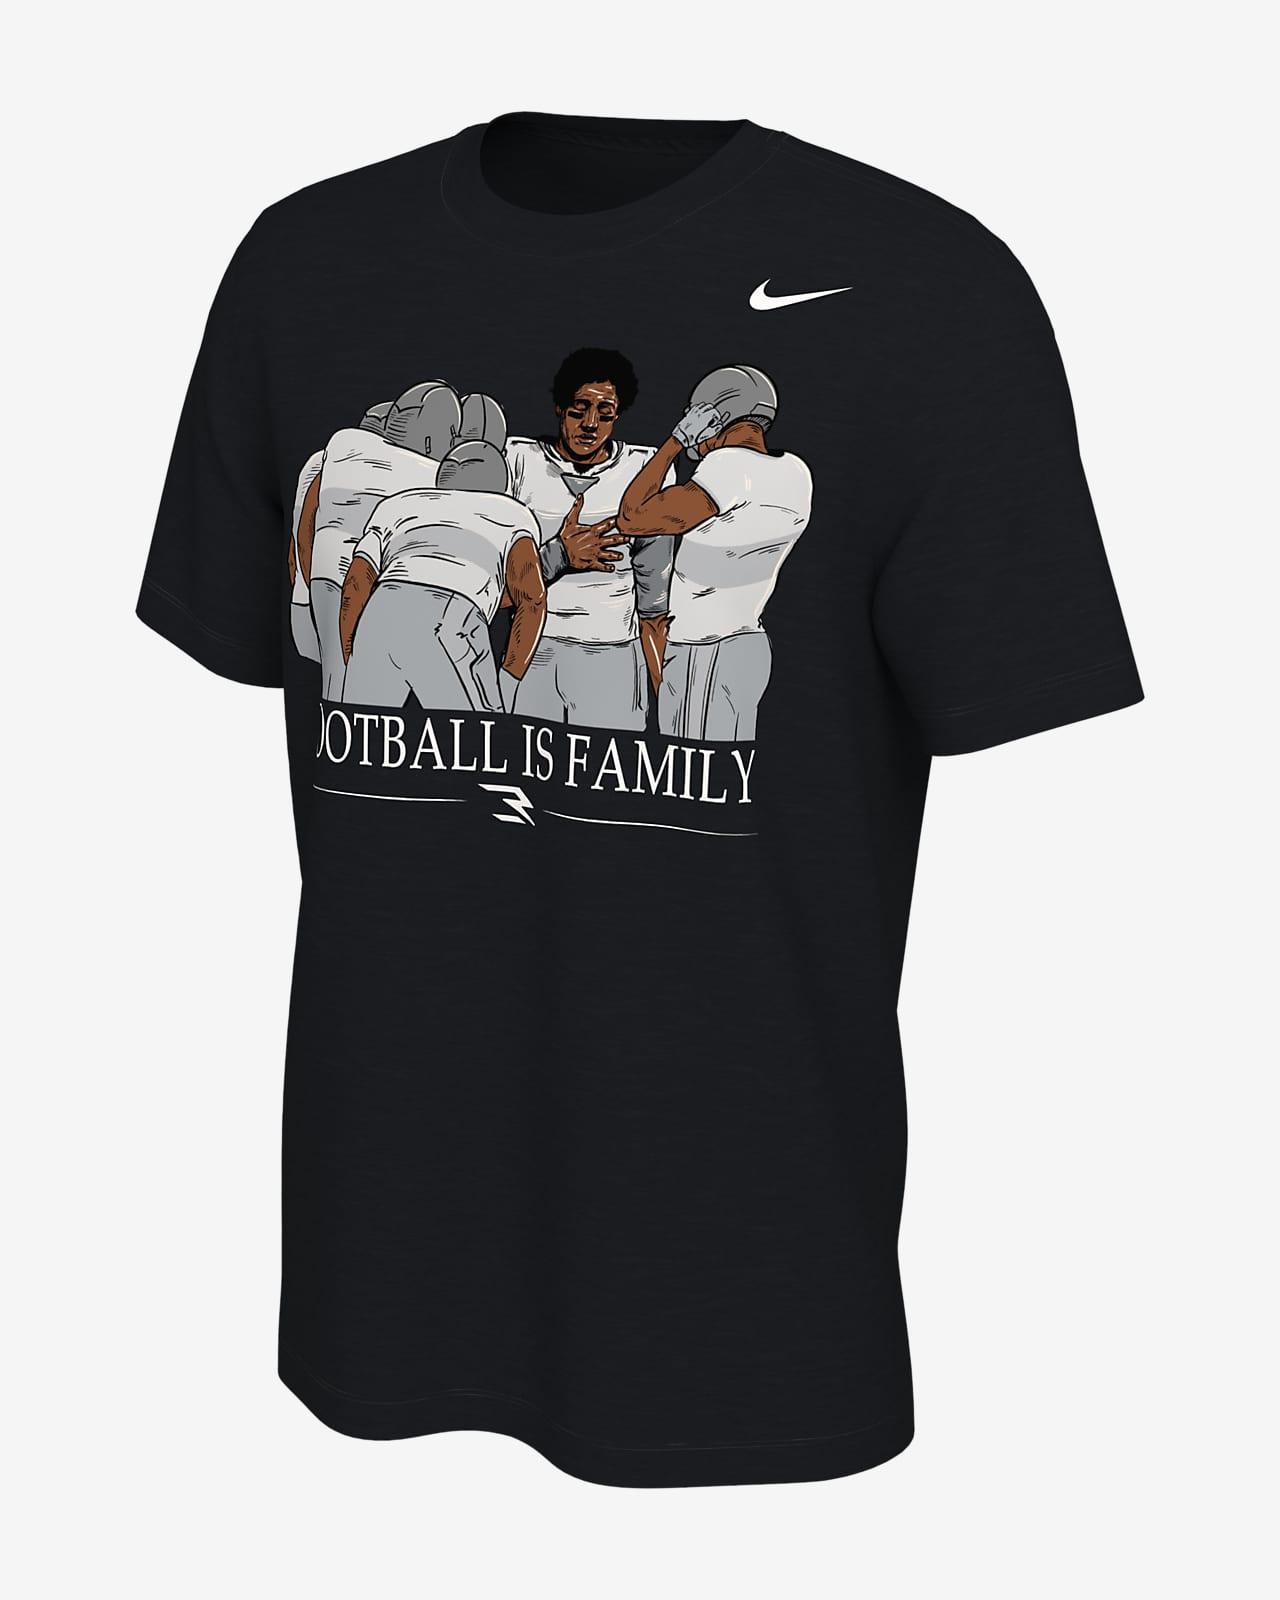 Playera para hombre Nike Dri-FIT (Russell Wilson)